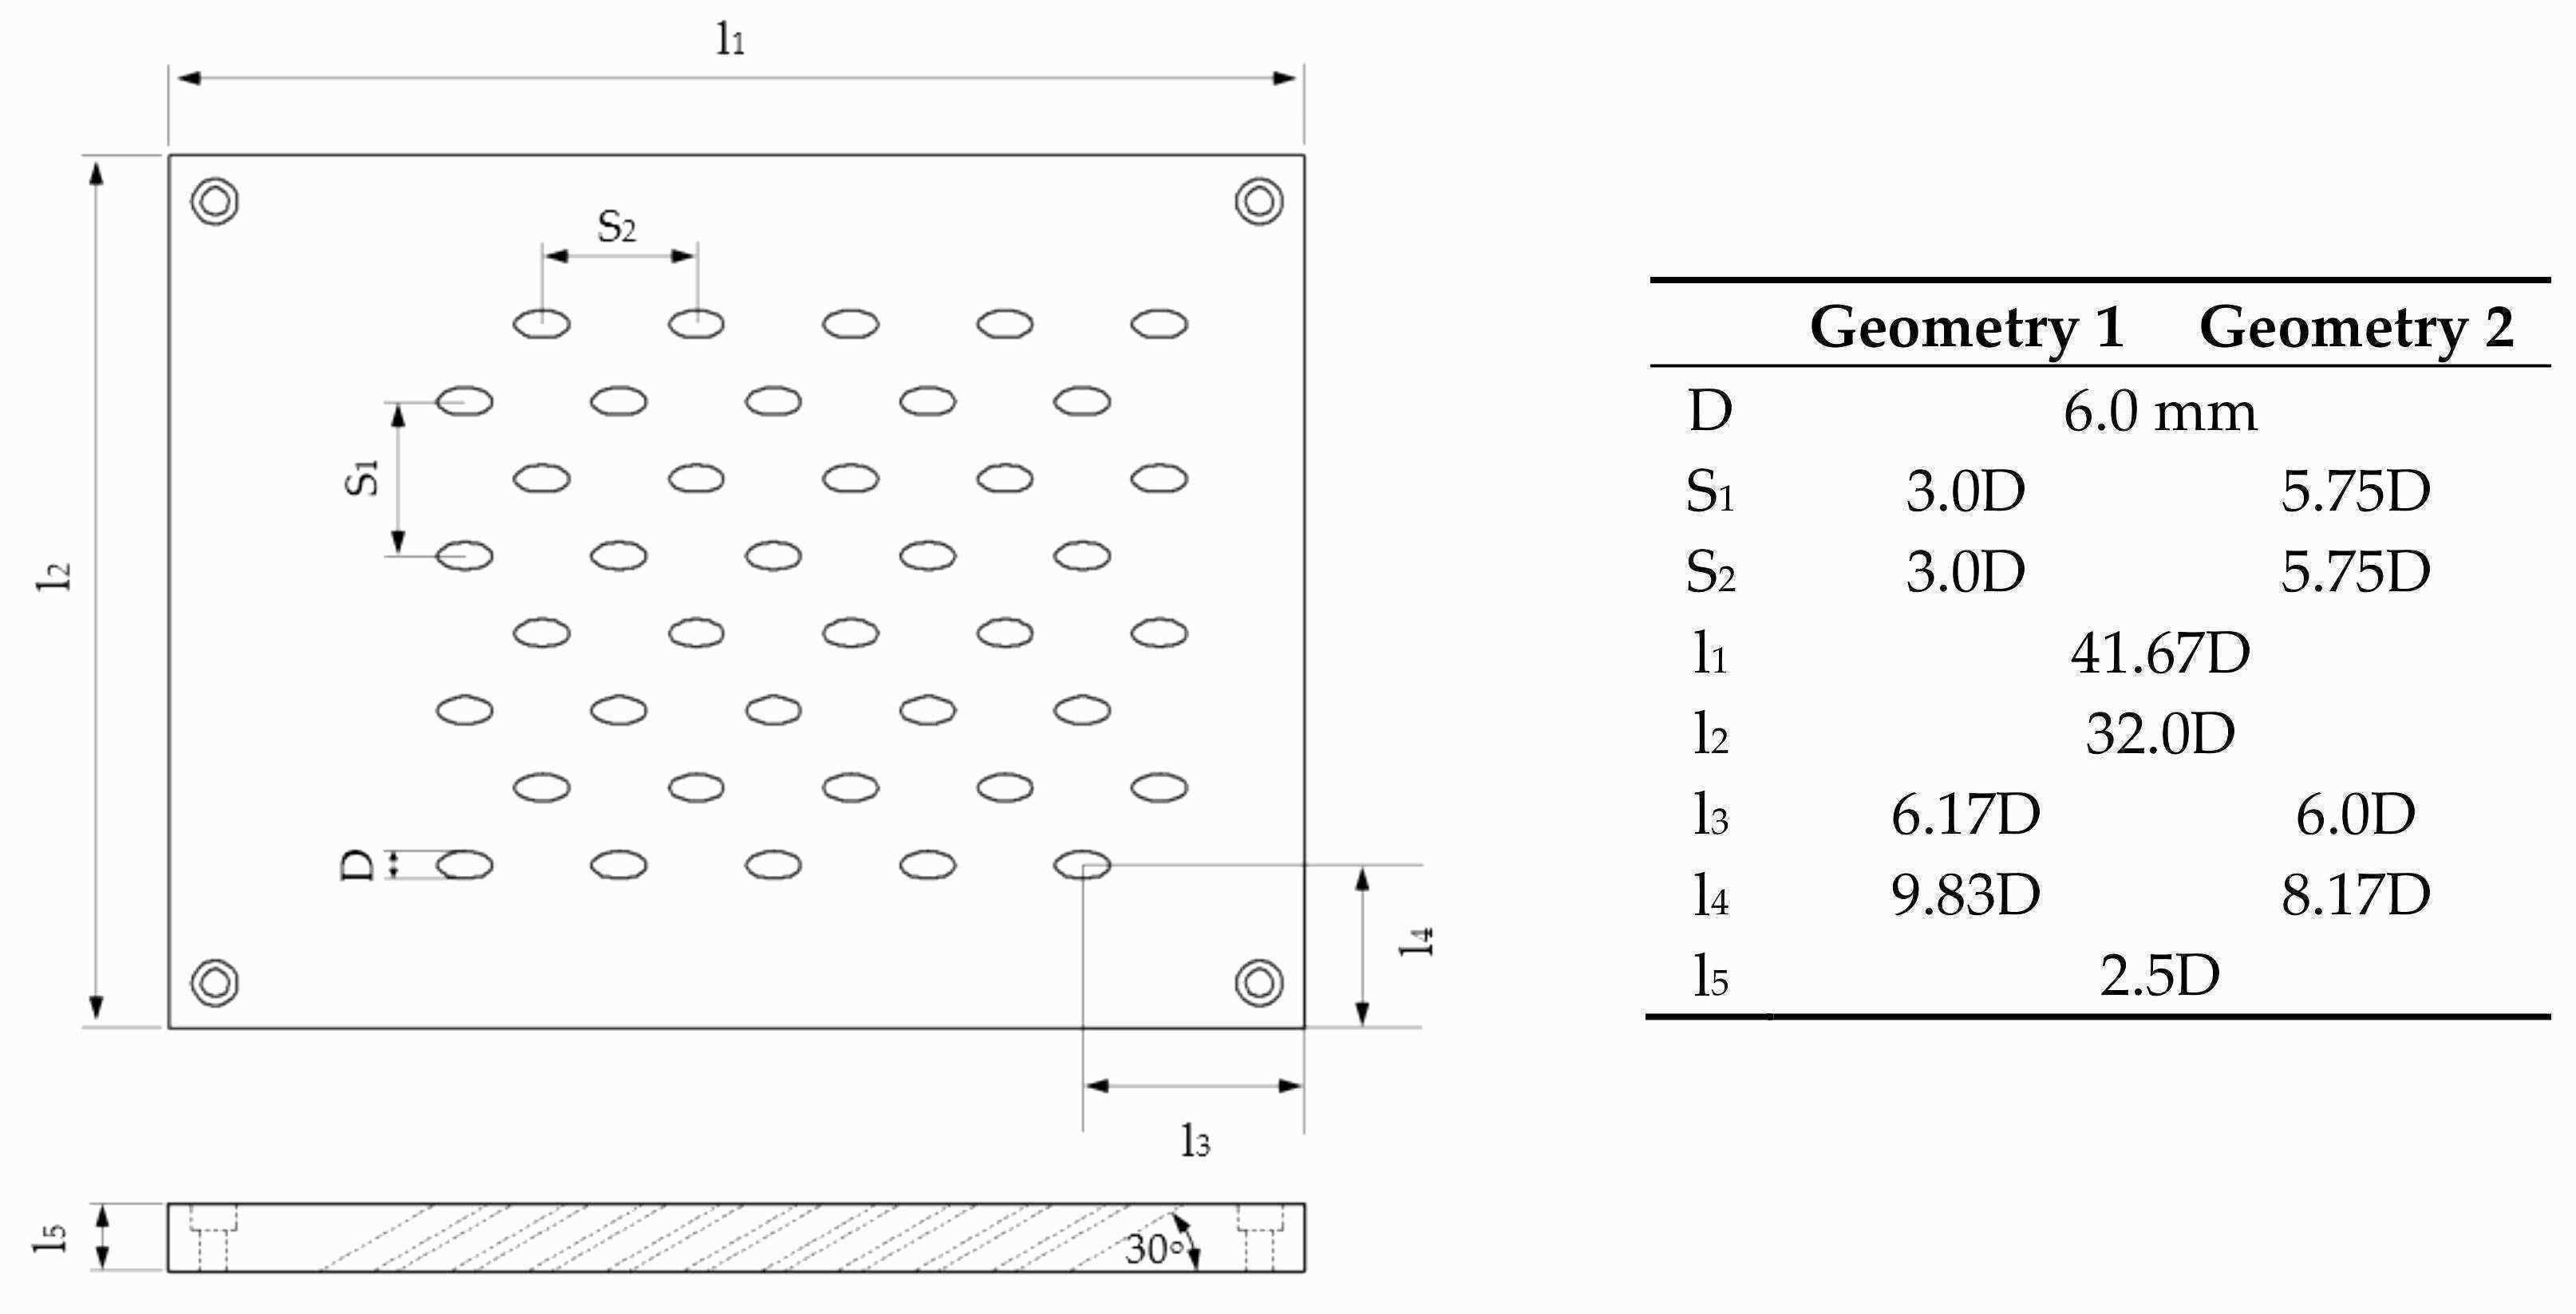 1 X 2 5 8 Label Template - 10+ Professional Templates Ideas Regarding Word Label Template 21 Per Sheet